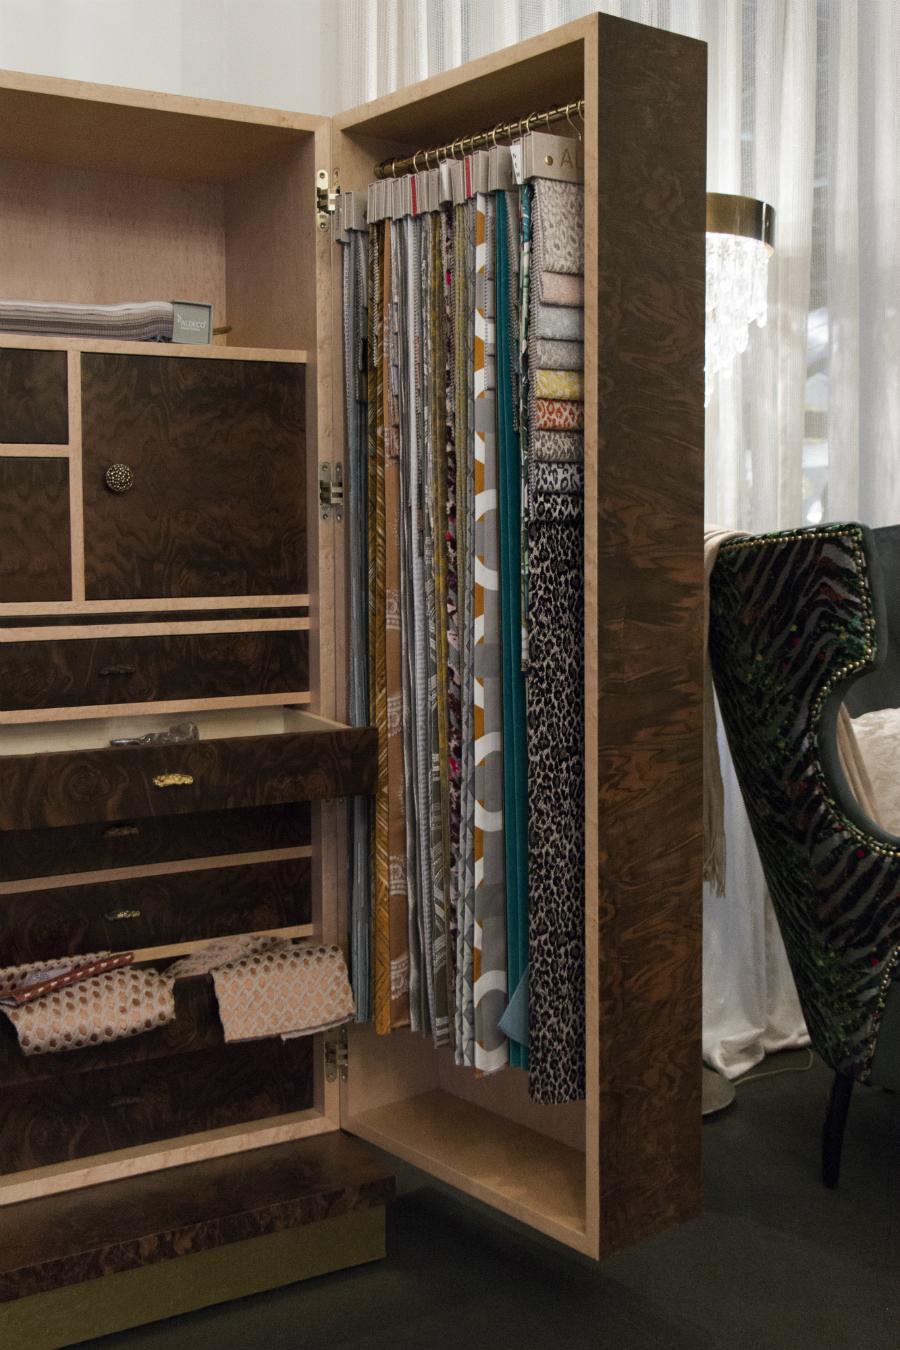 mo18  The Best Of Maison et Objet 2018: Stunning Upholstery Fabrics UF mo18